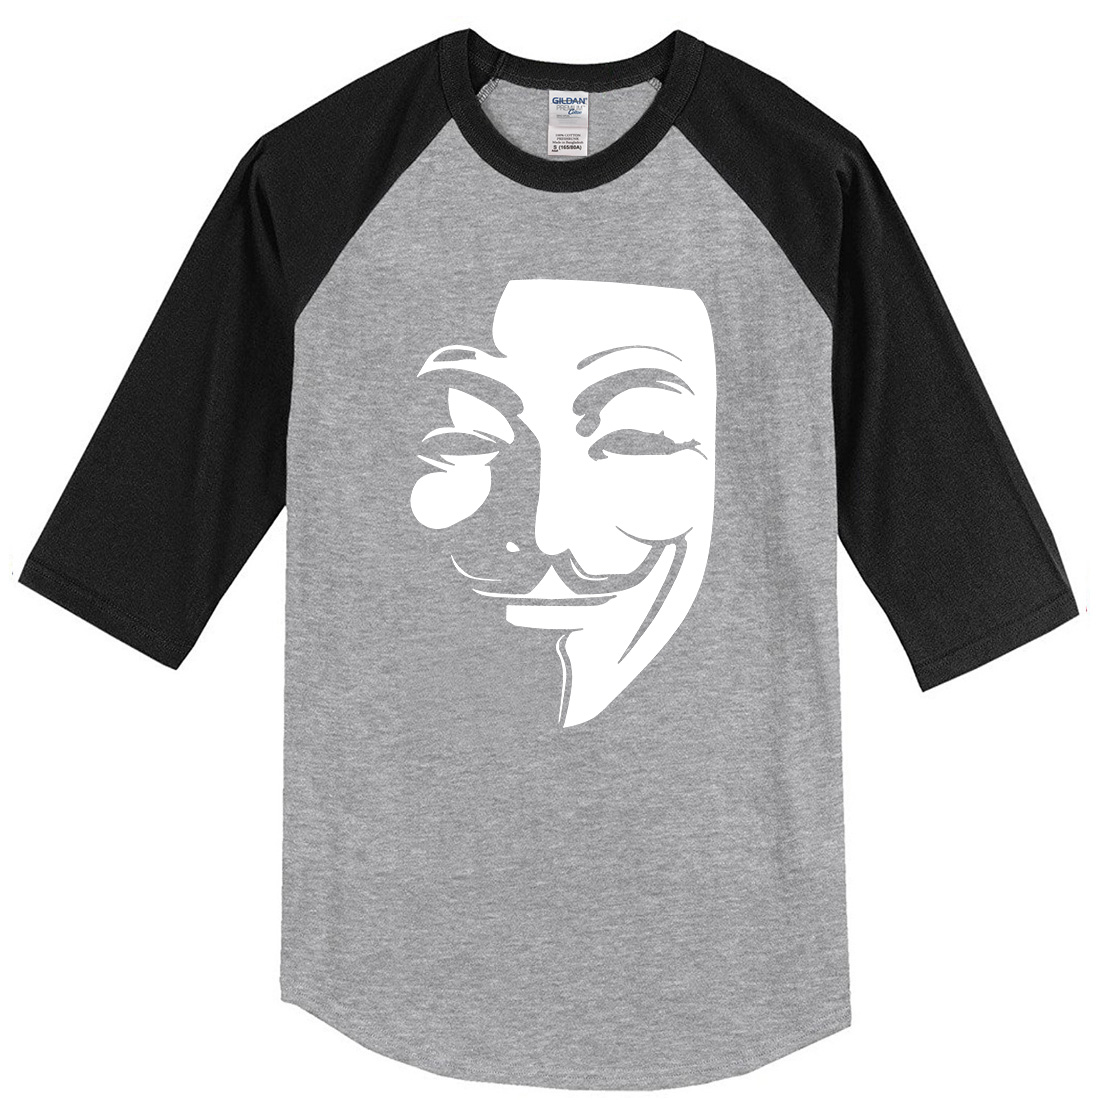 Summer 2019 men's T-shirts three quarter sleeve t shirt V for Vendetta sportswear raglan T-shirt streetwear top t shirt kpop